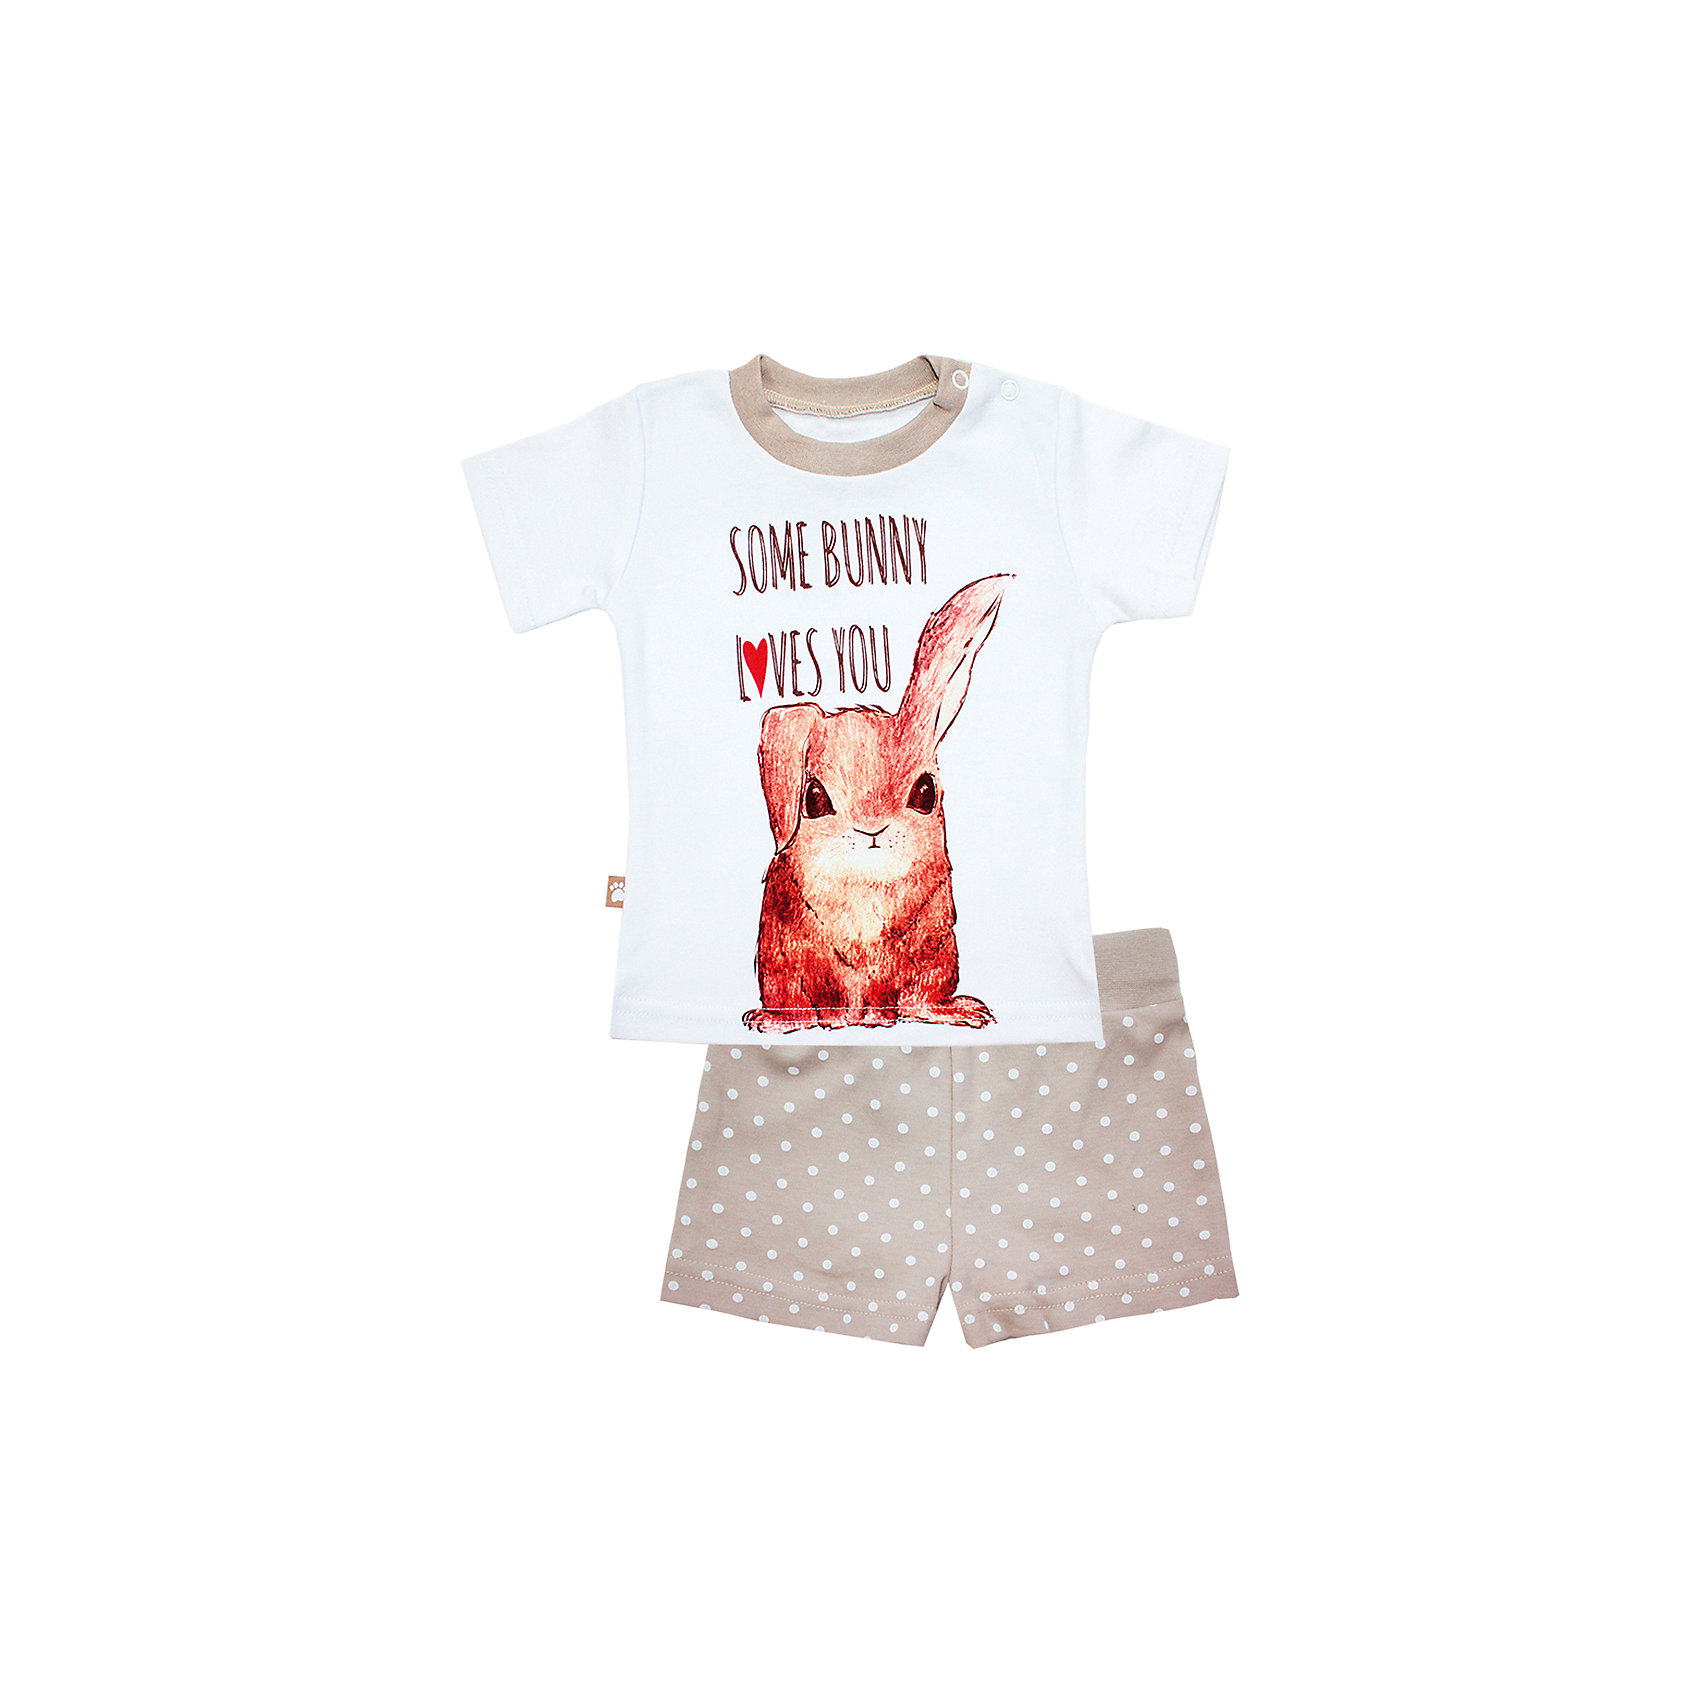 Пижама: футболка и шорты для девочки КотМарКотПижамы и сорочки<br>Пижама: футболка и шорты для девочки от известного бренда КотМарКот<br>Состав:<br>100% хлопок<br><br>Ширина мм: 281<br>Глубина мм: 70<br>Высота мм: 188<br>Вес г: 295<br>Цвет: бежевый<br>Возраст от месяцев: 48<br>Возраст до месяцев: 60<br>Пол: Женский<br>Возраст: Детский<br>Размер: 110,116,92,122,98,104<br>SKU: 4873281